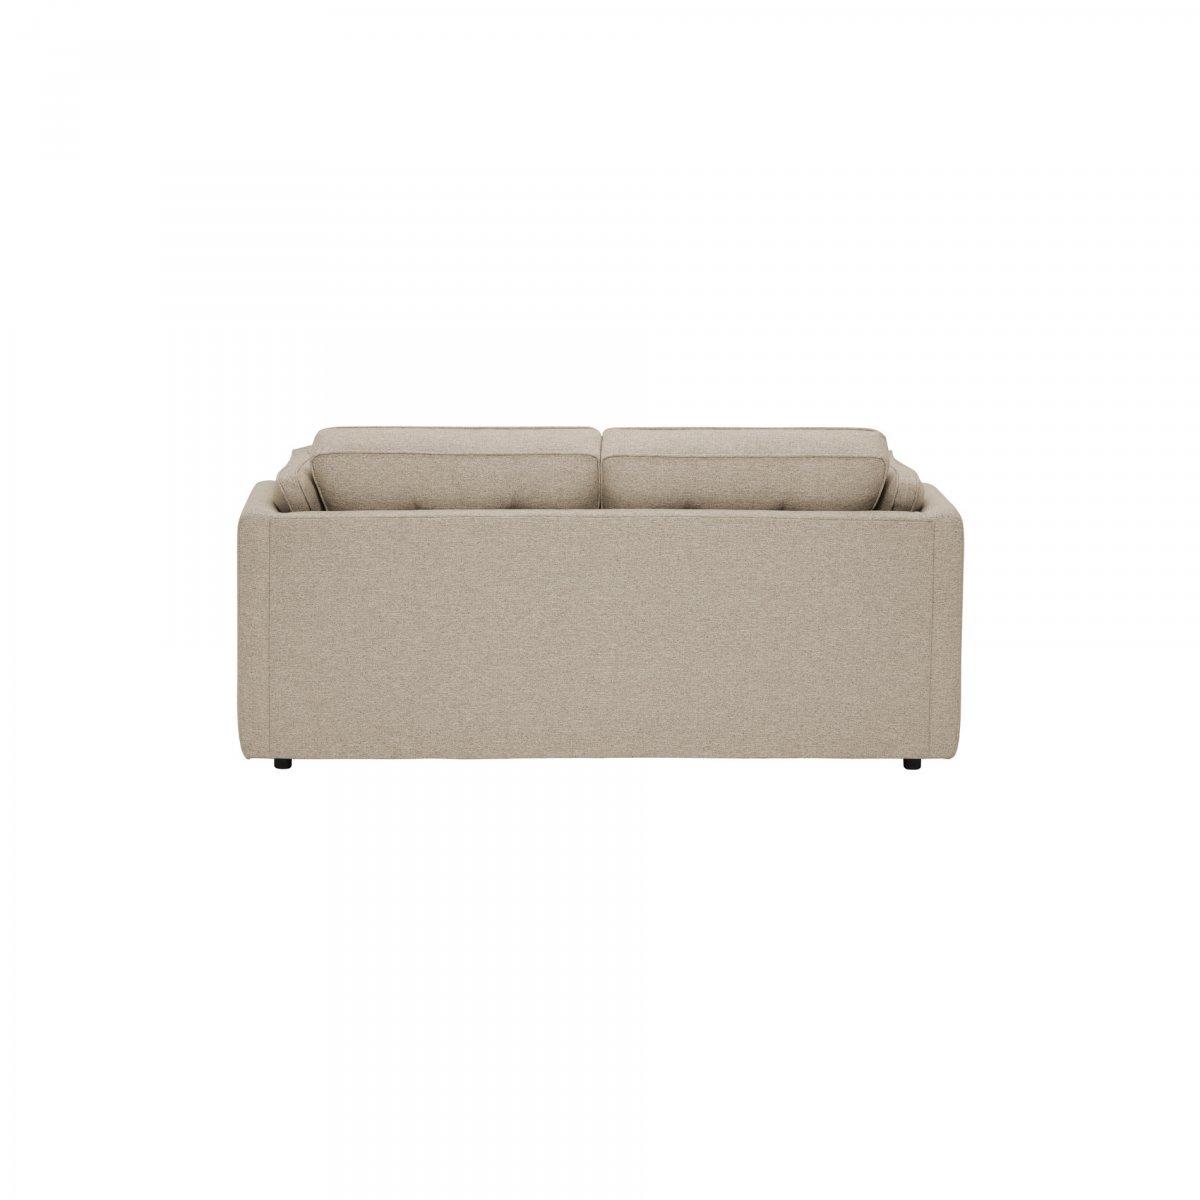 Pasadena Small Sofa Delivered Free Oak Furniture Land